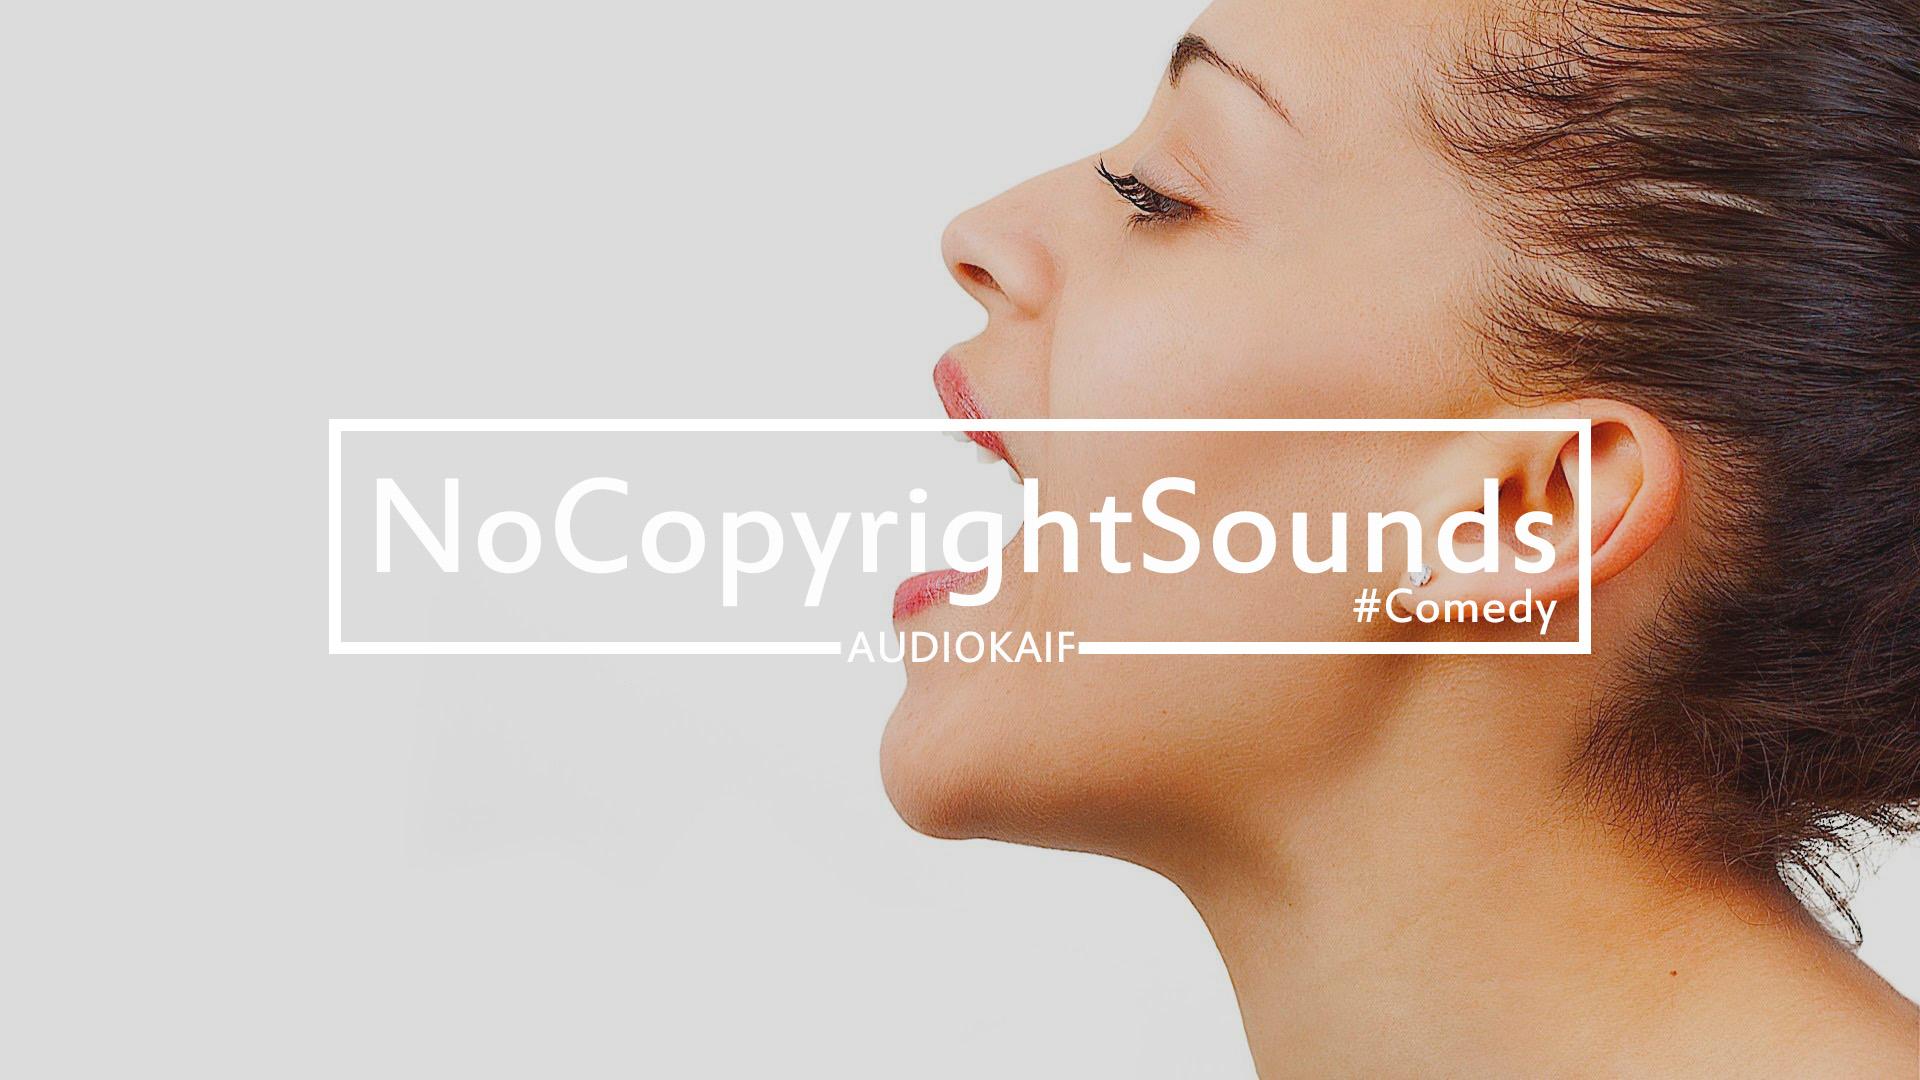 Музыка без авторского права | Doo Wop Singers 3 | Comedy